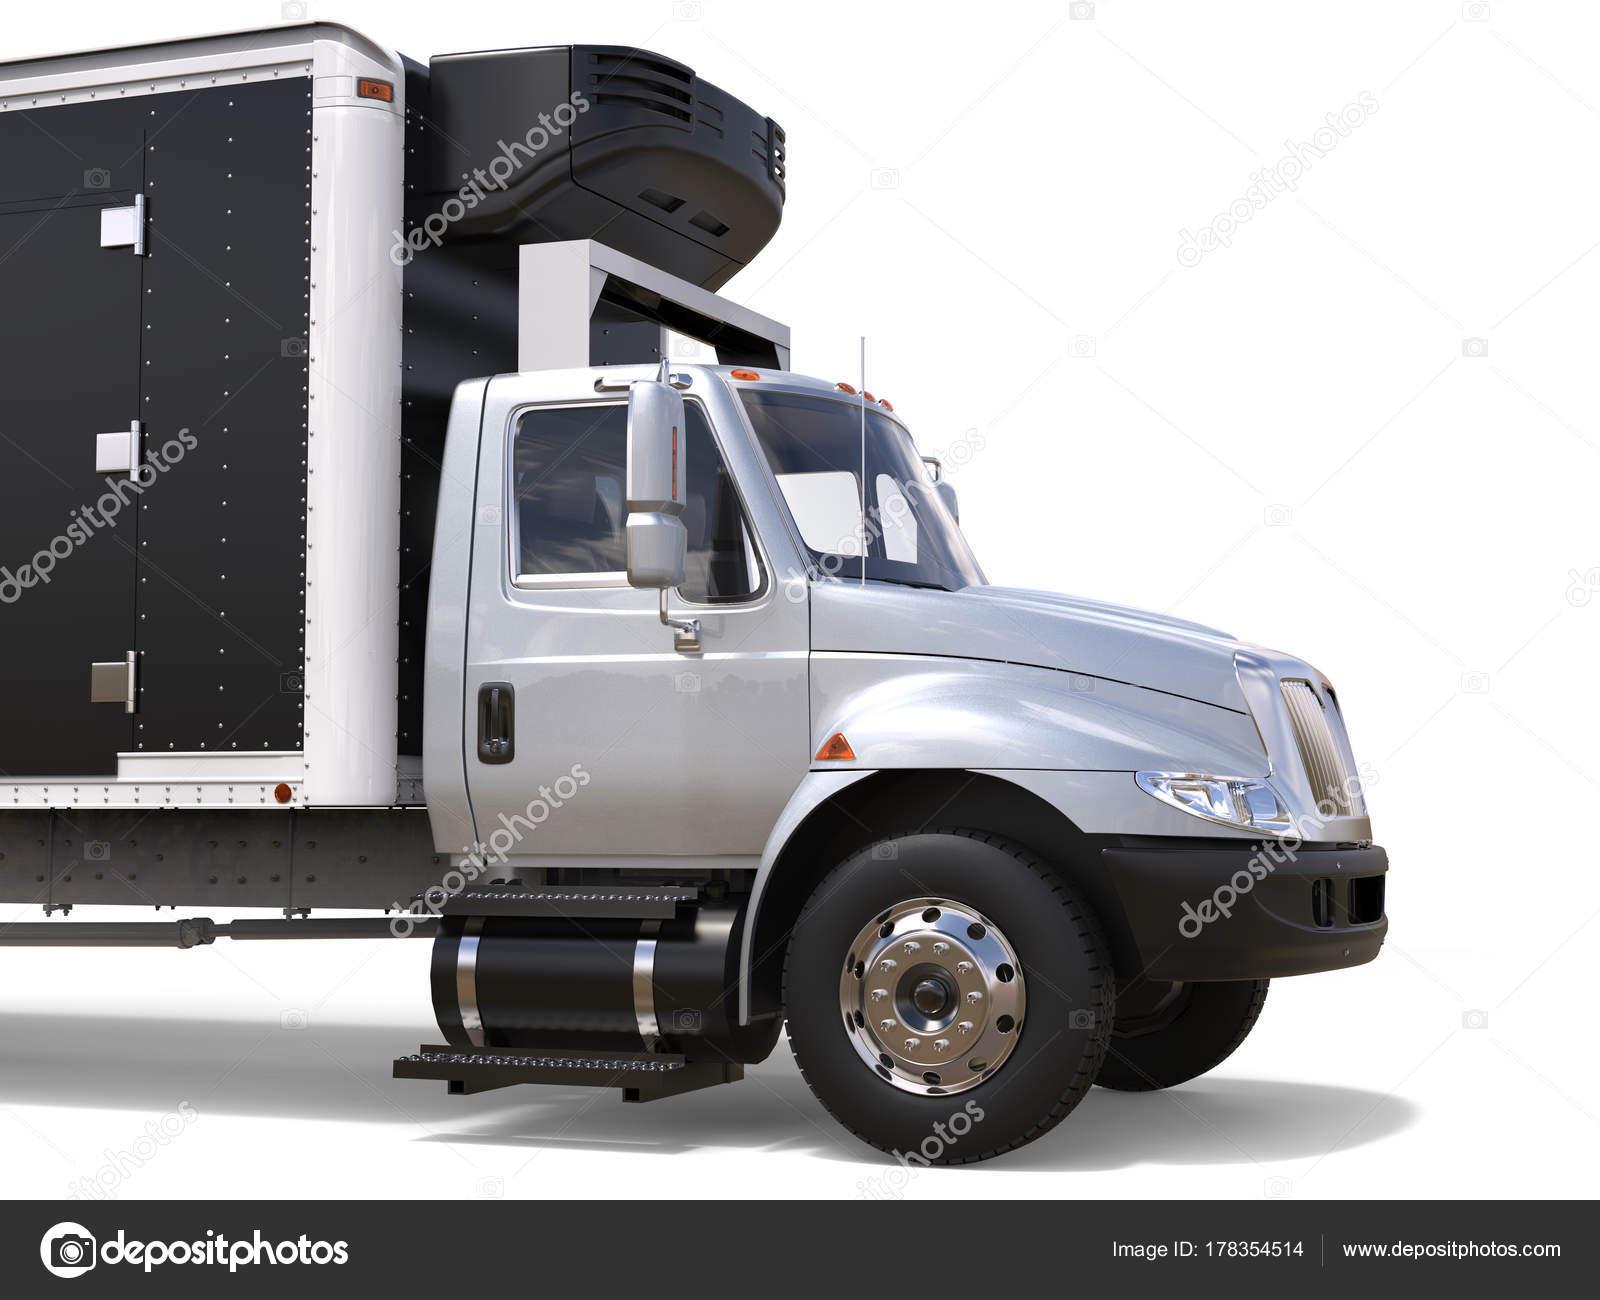 Amerikanischer Kühlschrank Transportieren : Silber kühlschrank lkw front nahaufnahme geschnitten schuss